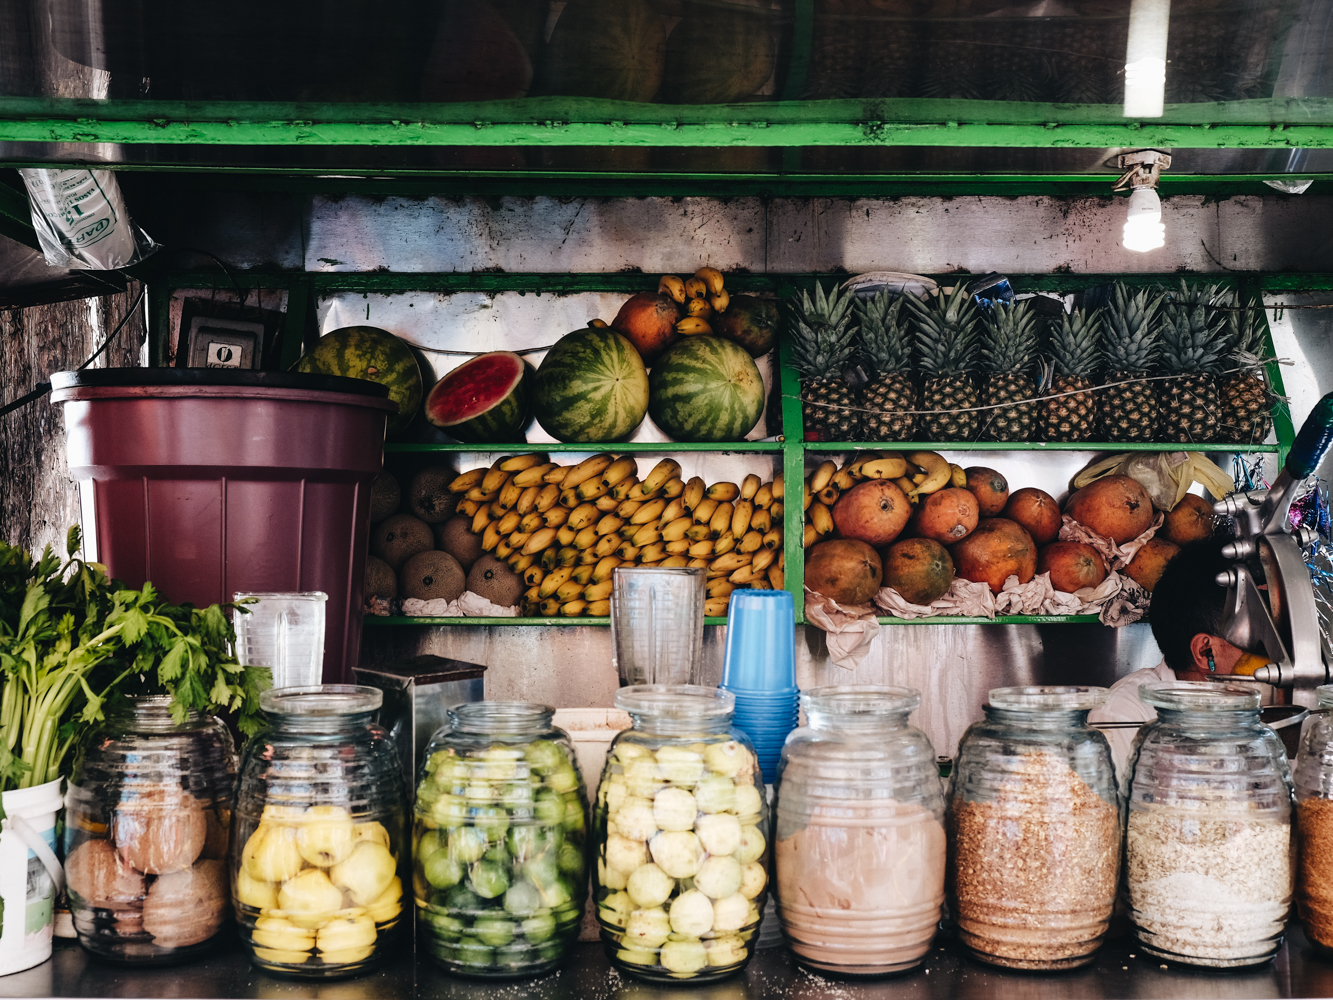 fruit-juices-frutas-jugos-refrescos-Cookwilltravel-Mexico_City.jpg